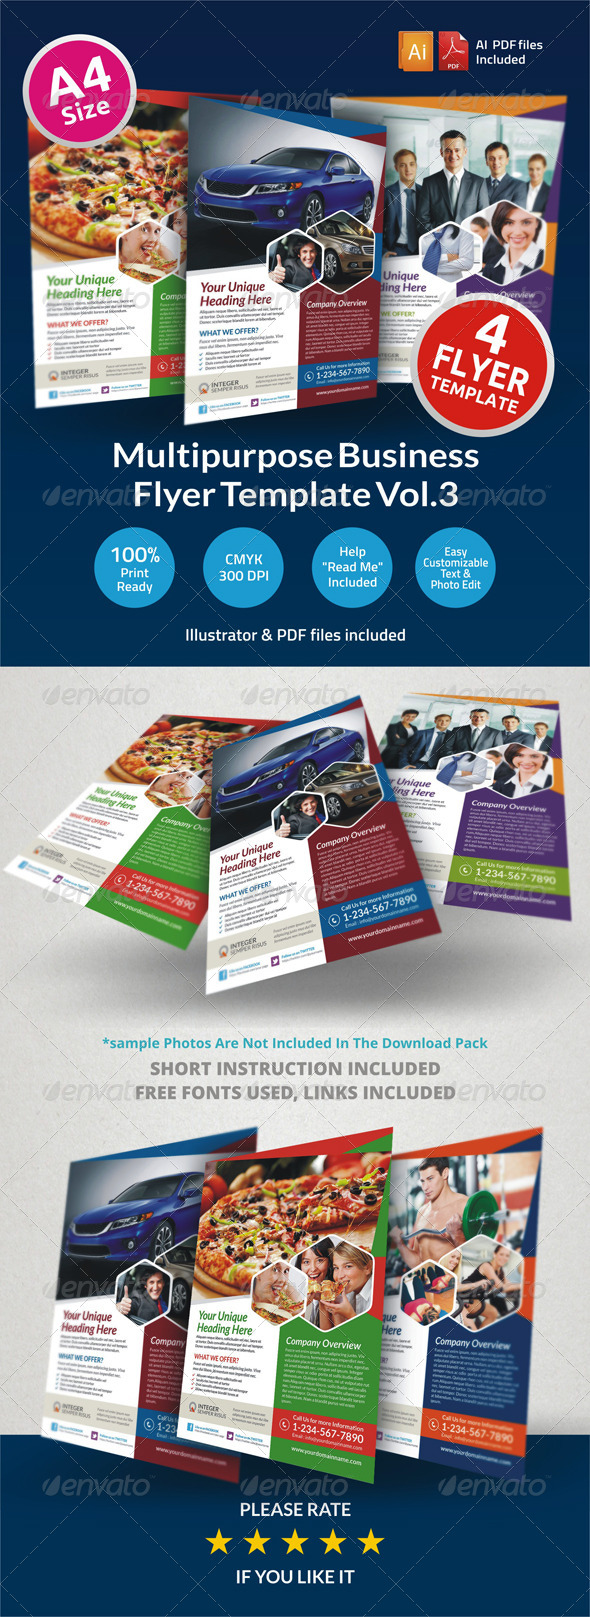 GraphicRiver Multipurpose Business Flyer Vol.3 6497326